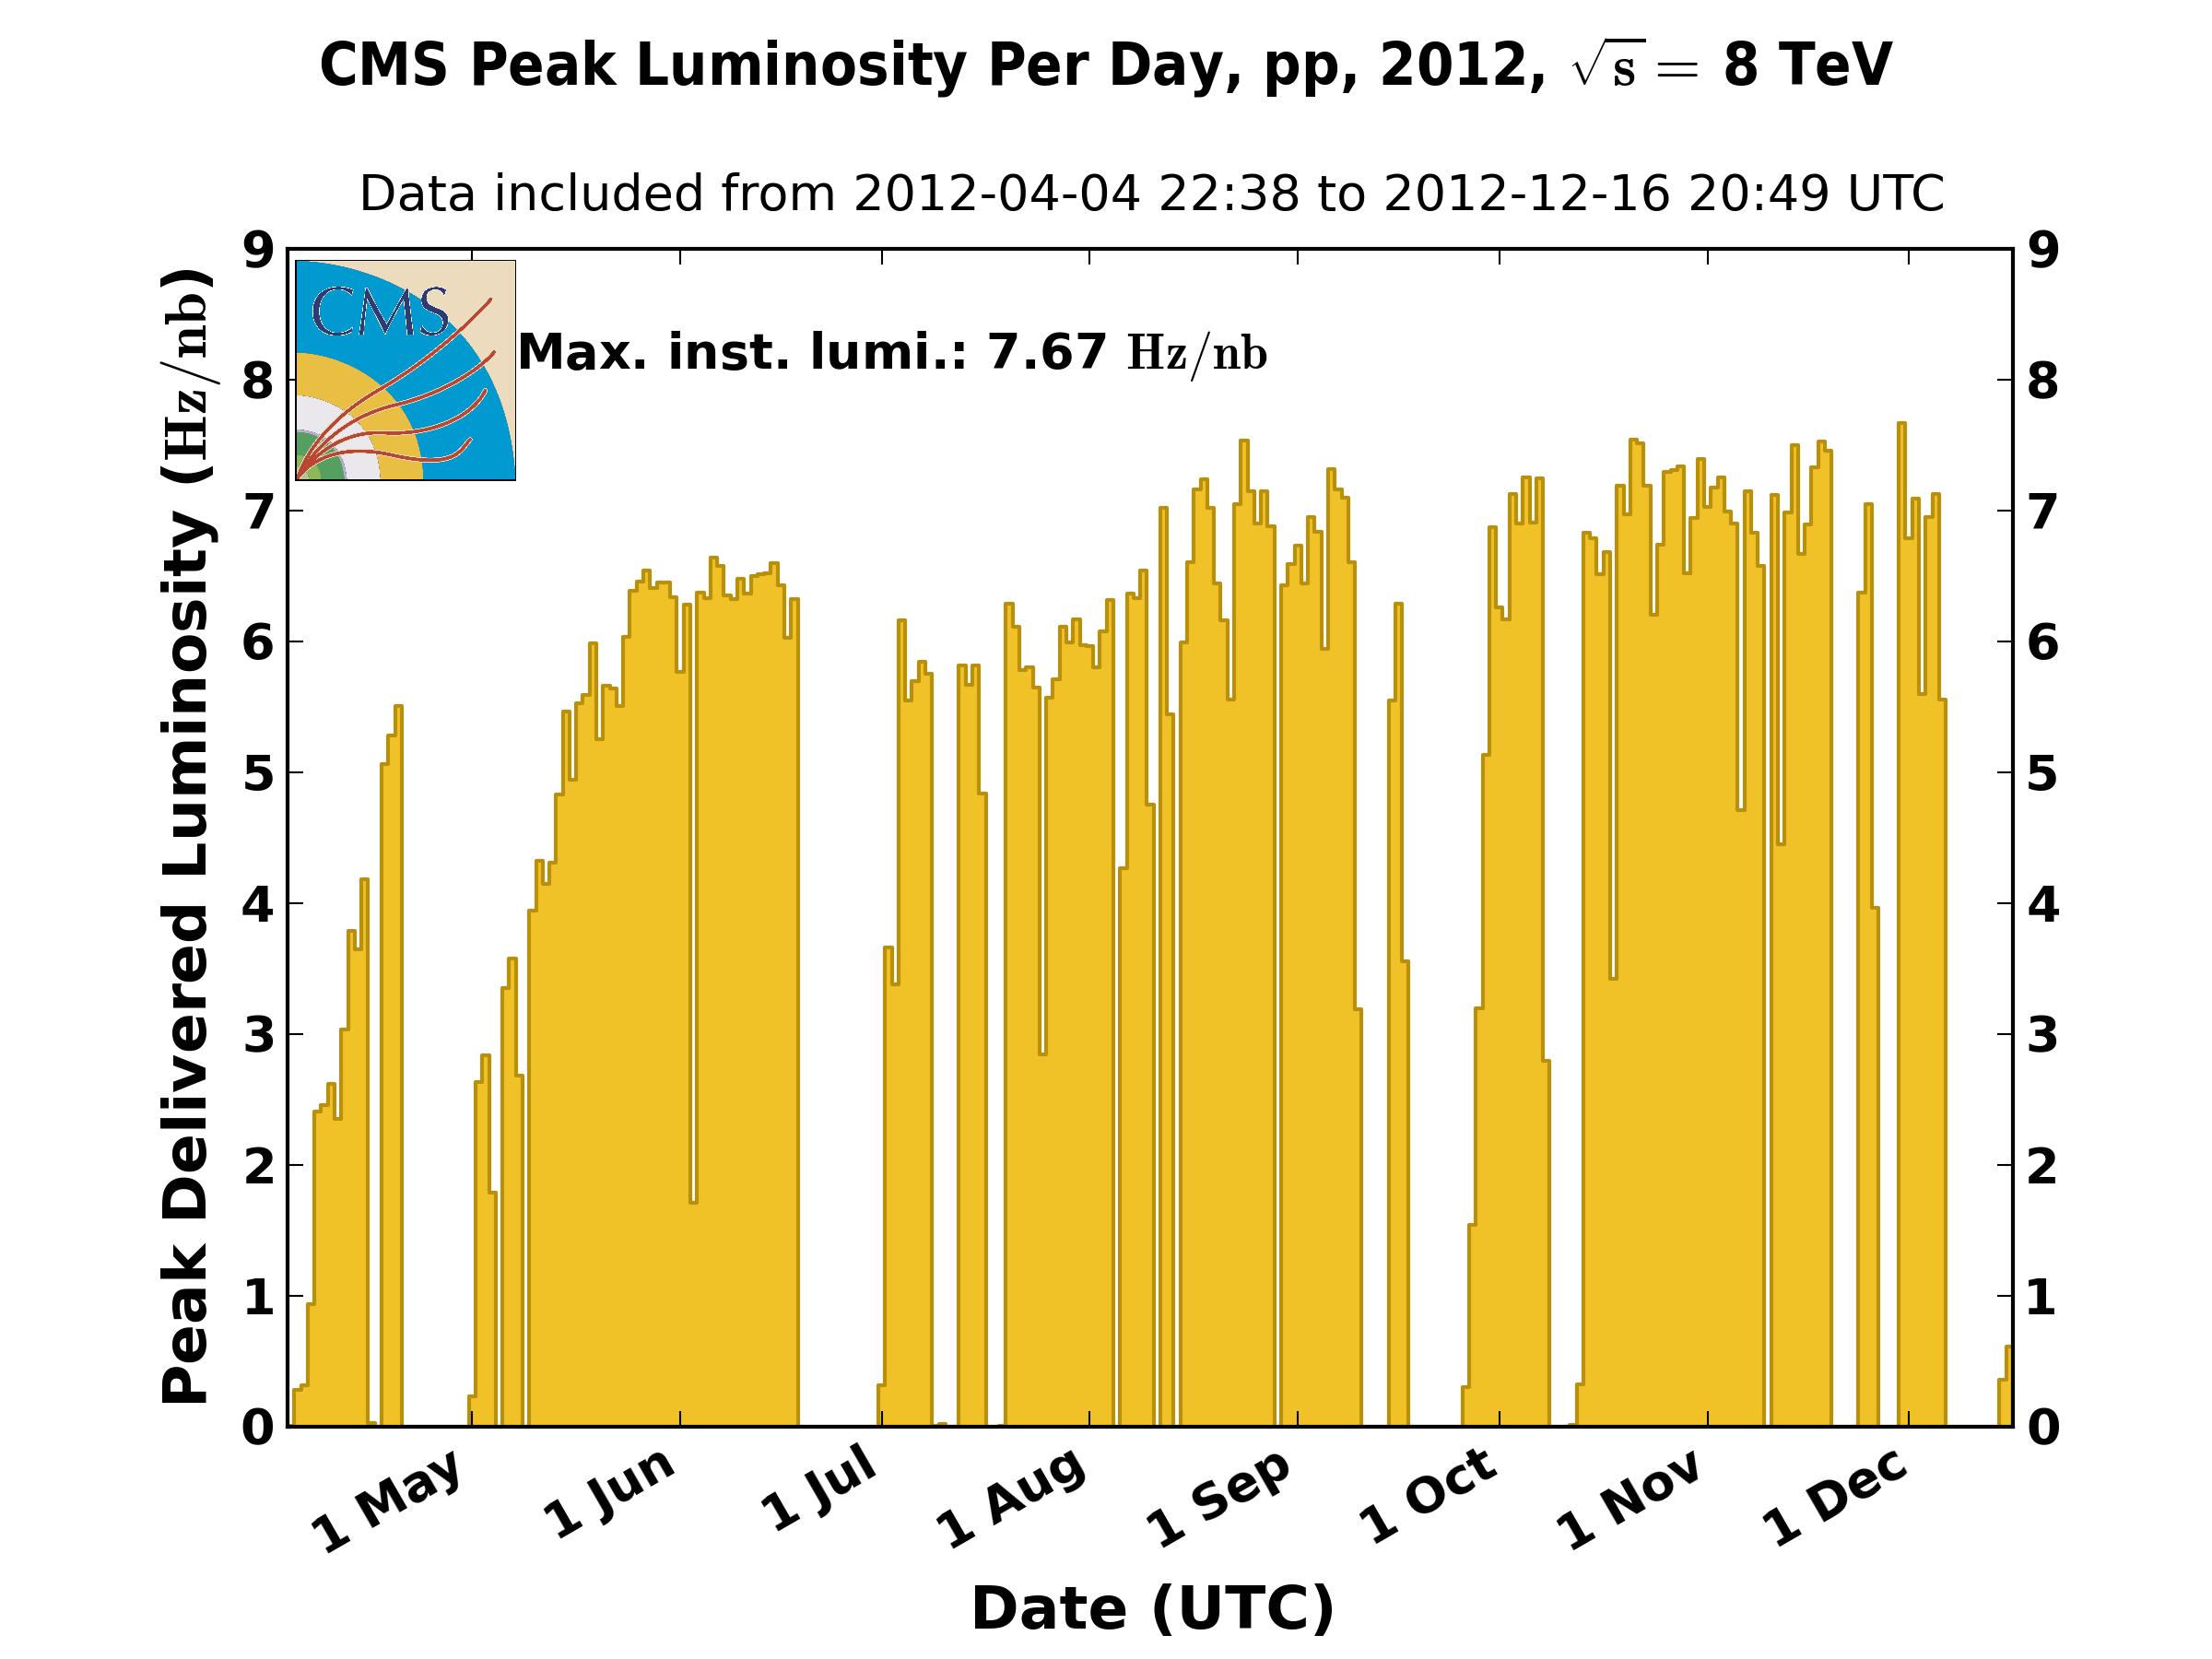 https://cern.ch/cmslumi/publicplots/peak_lumi_per_day_pp_2012.png